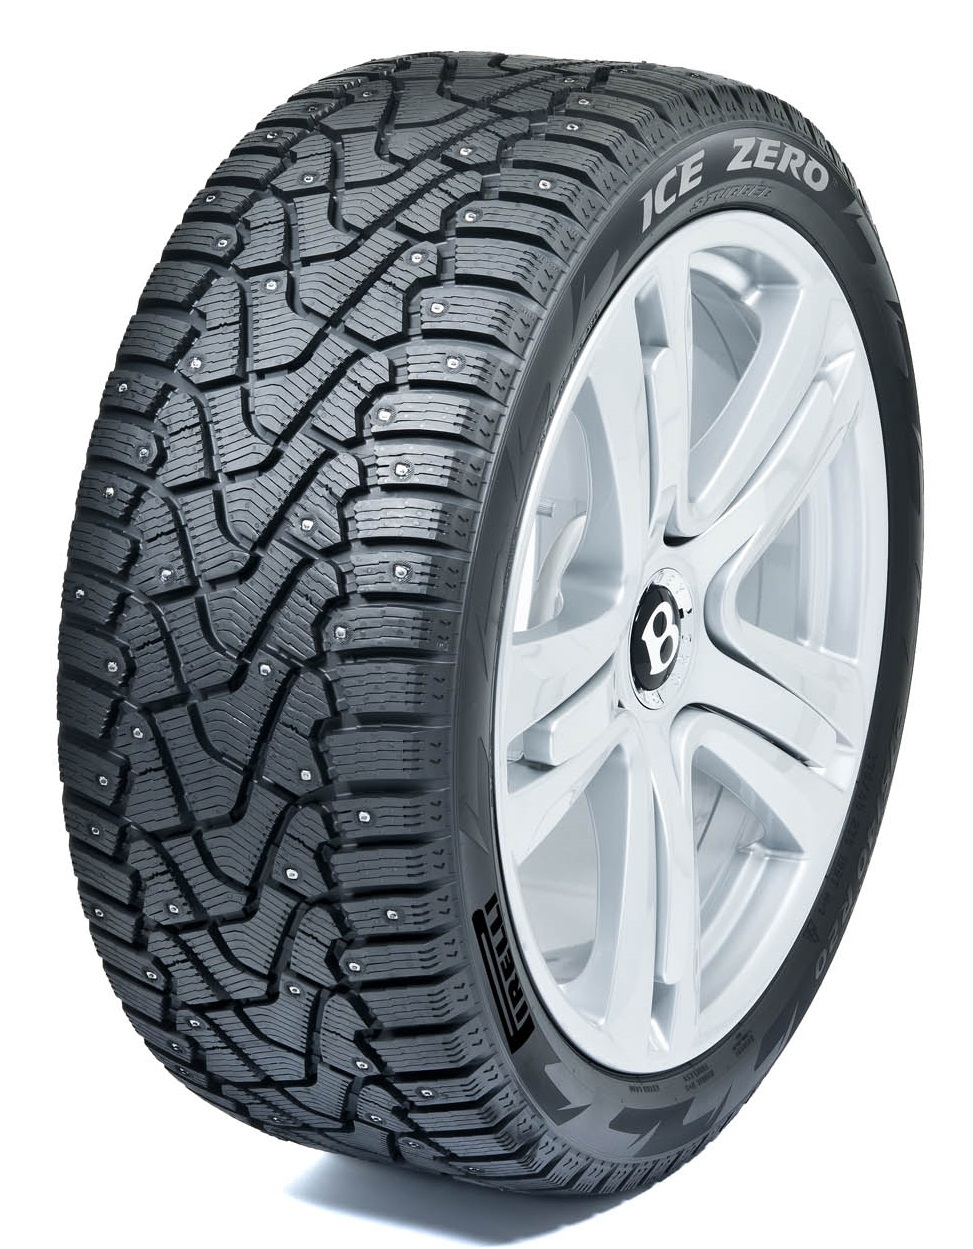 275/50R20 шип 113T Ice Zero XL Pirelli